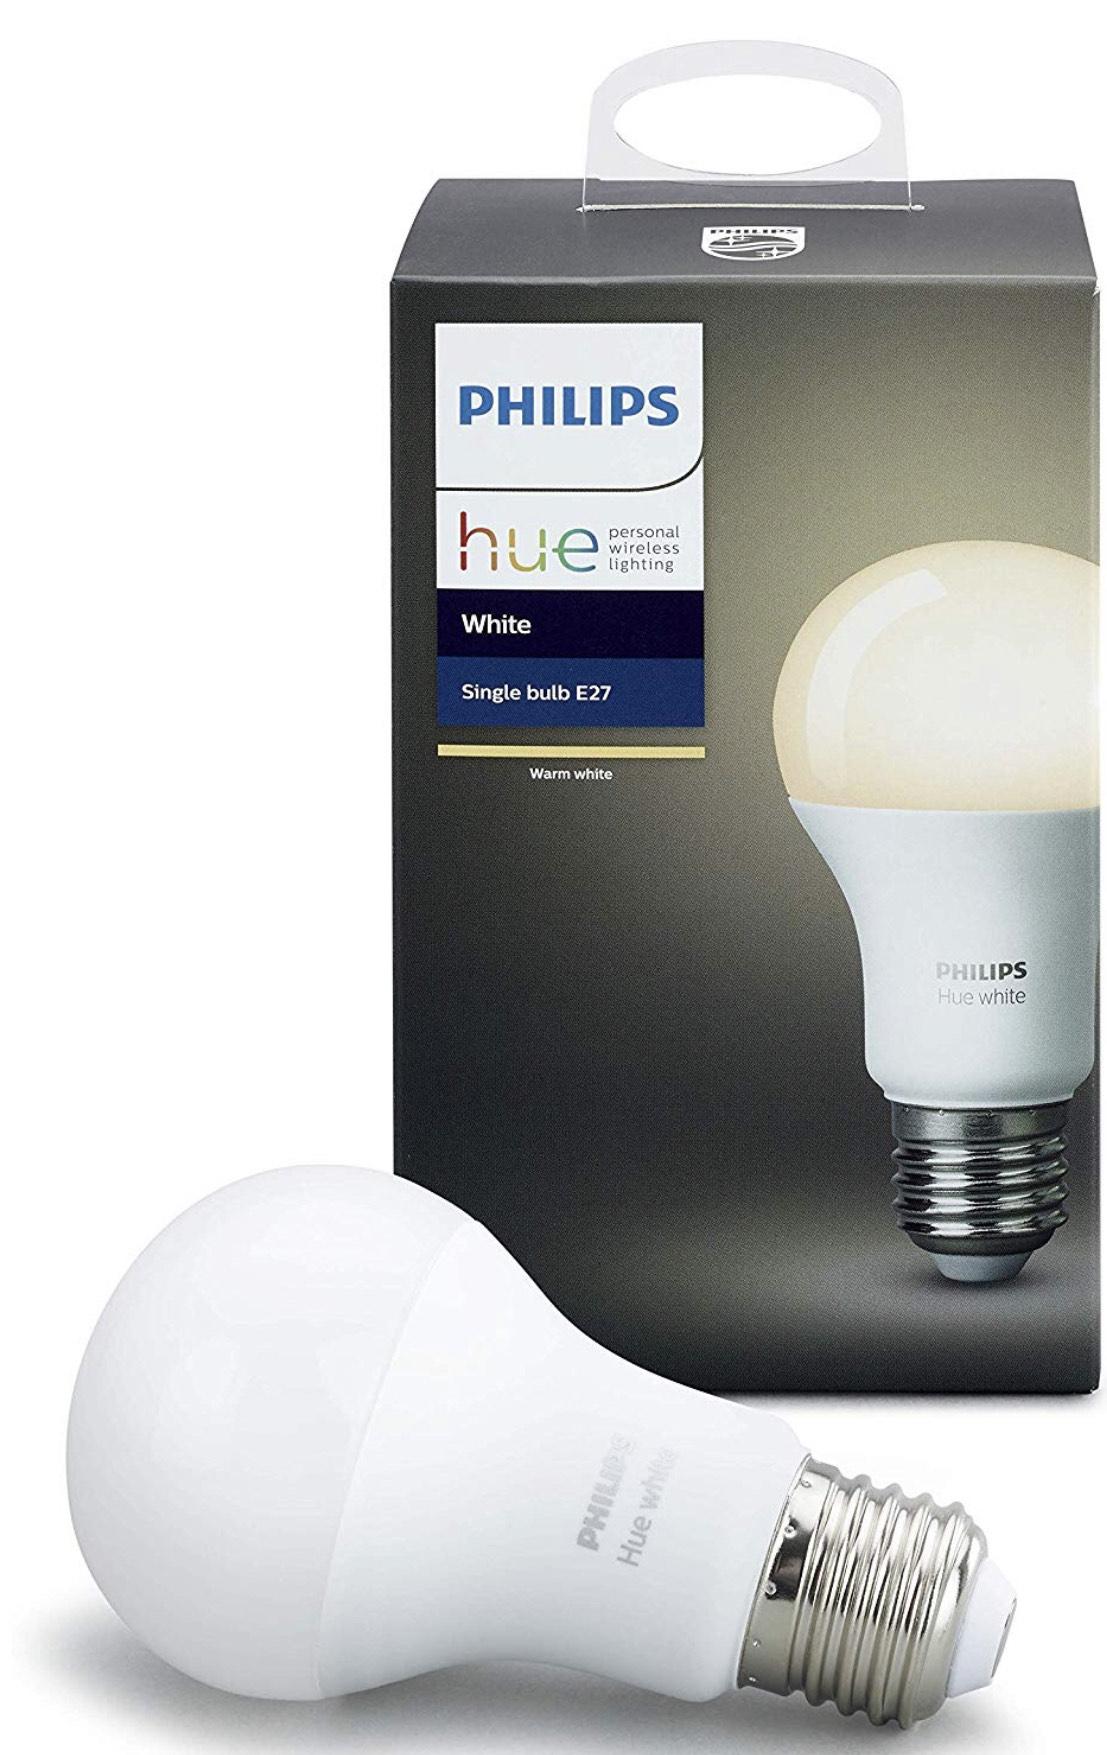 Amazon Warehouse Deal - Philips hue white E27